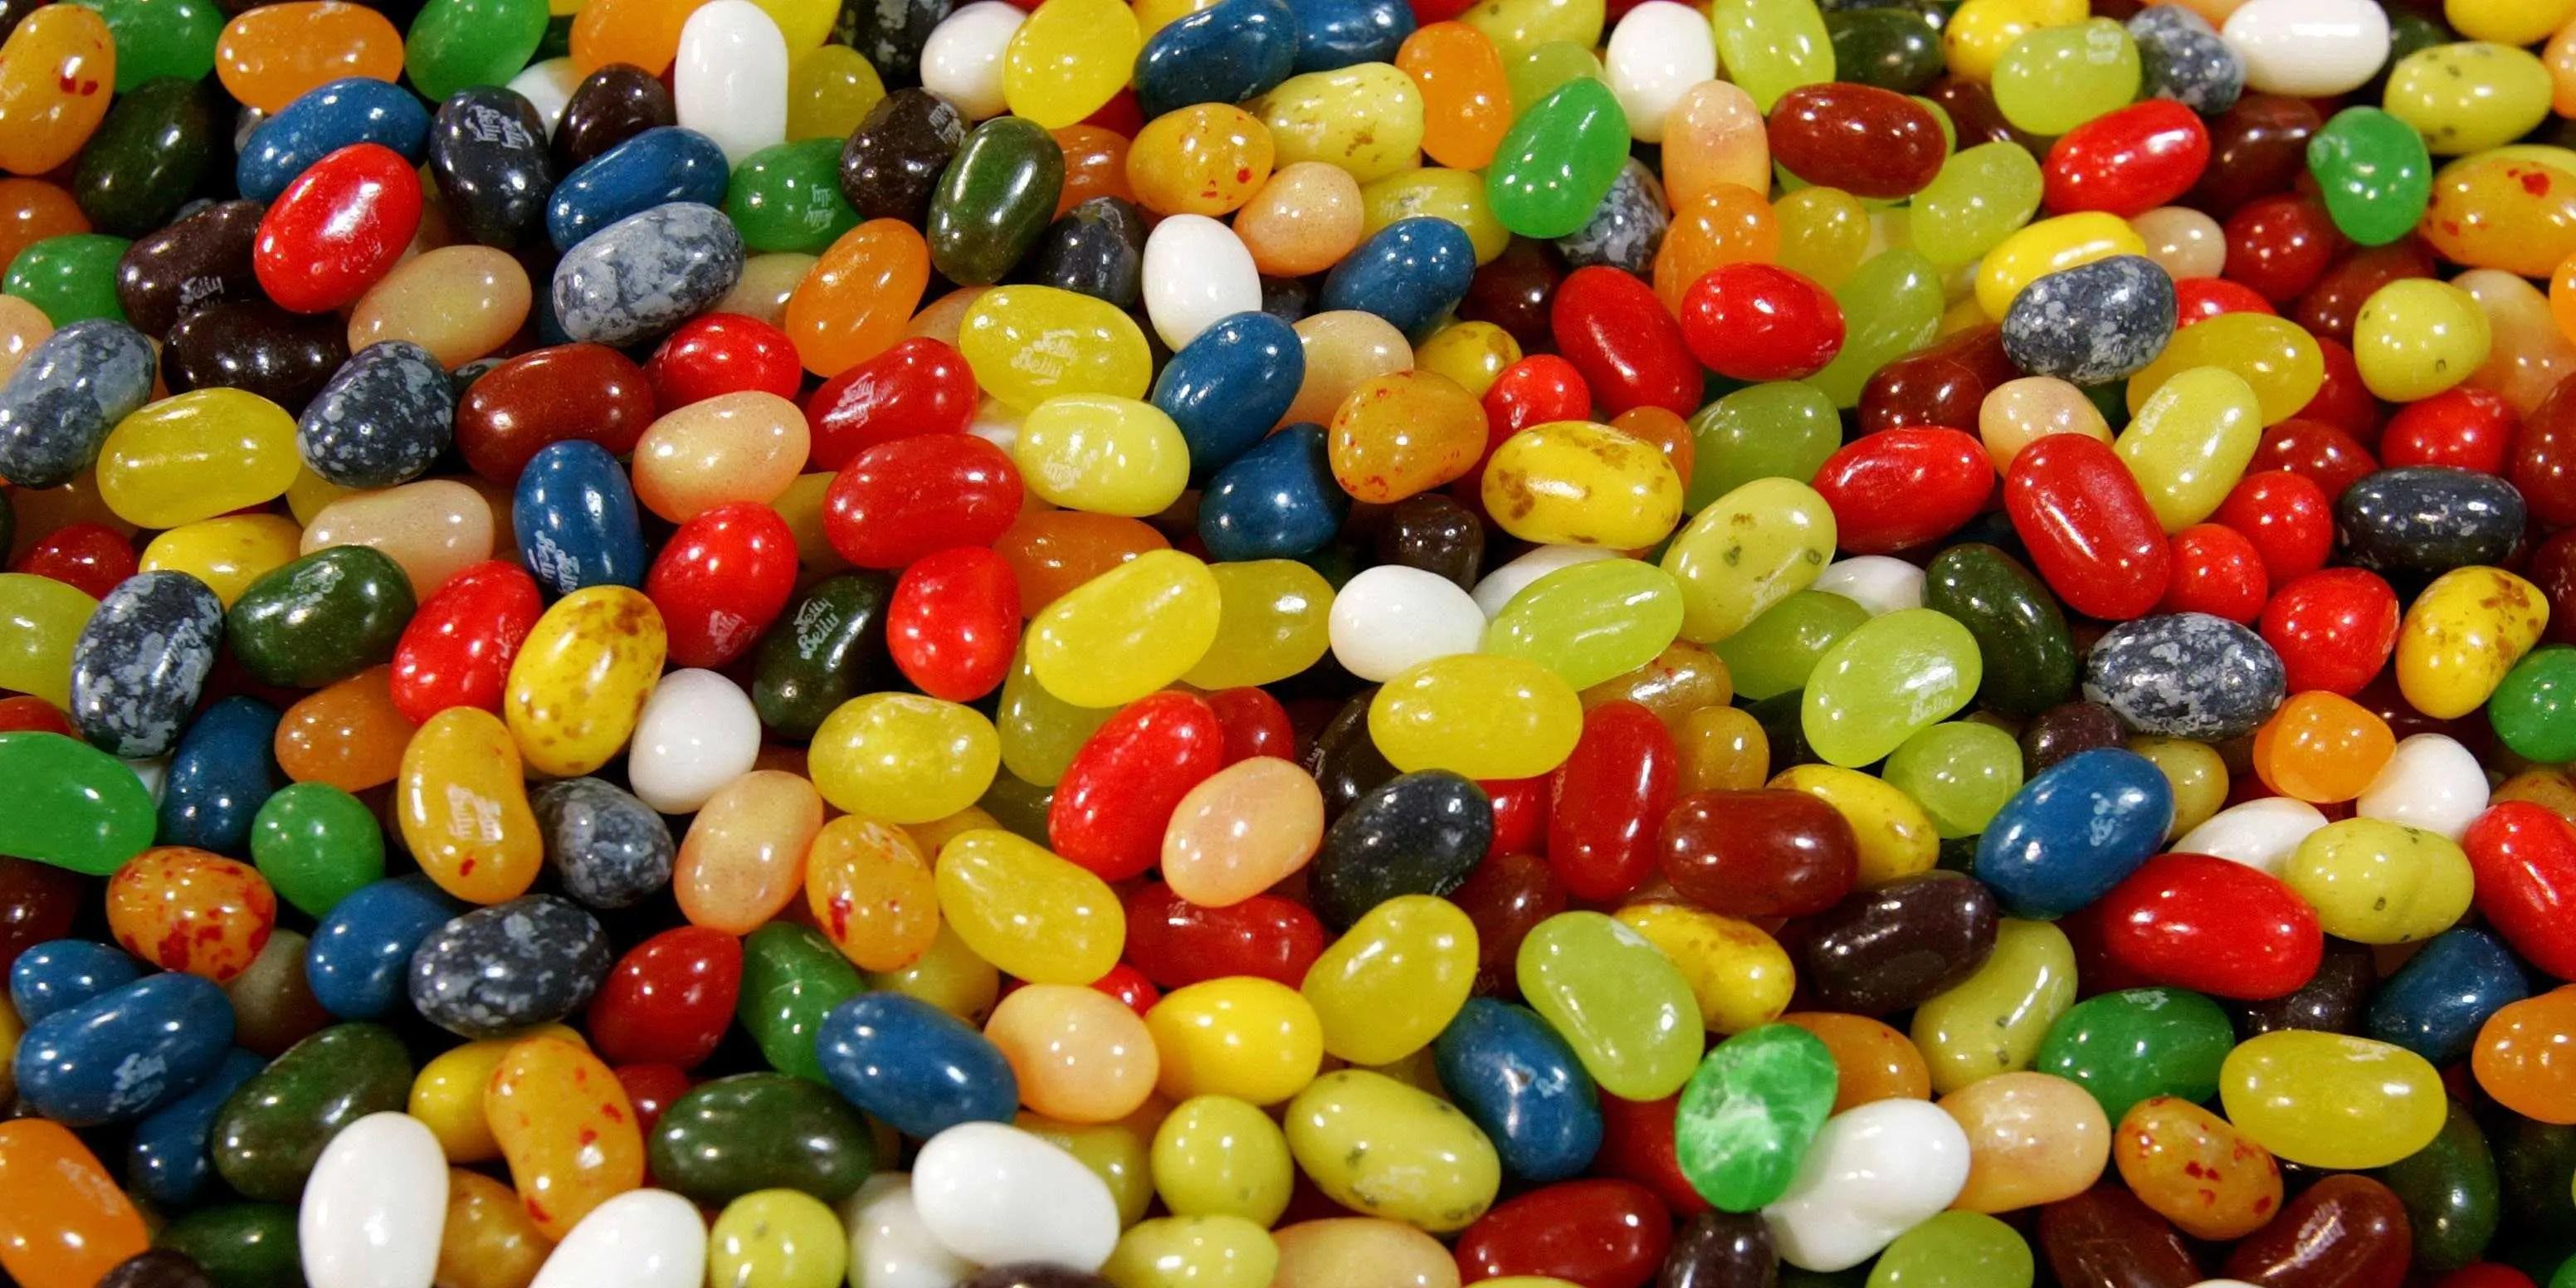 Sugar jelly beans